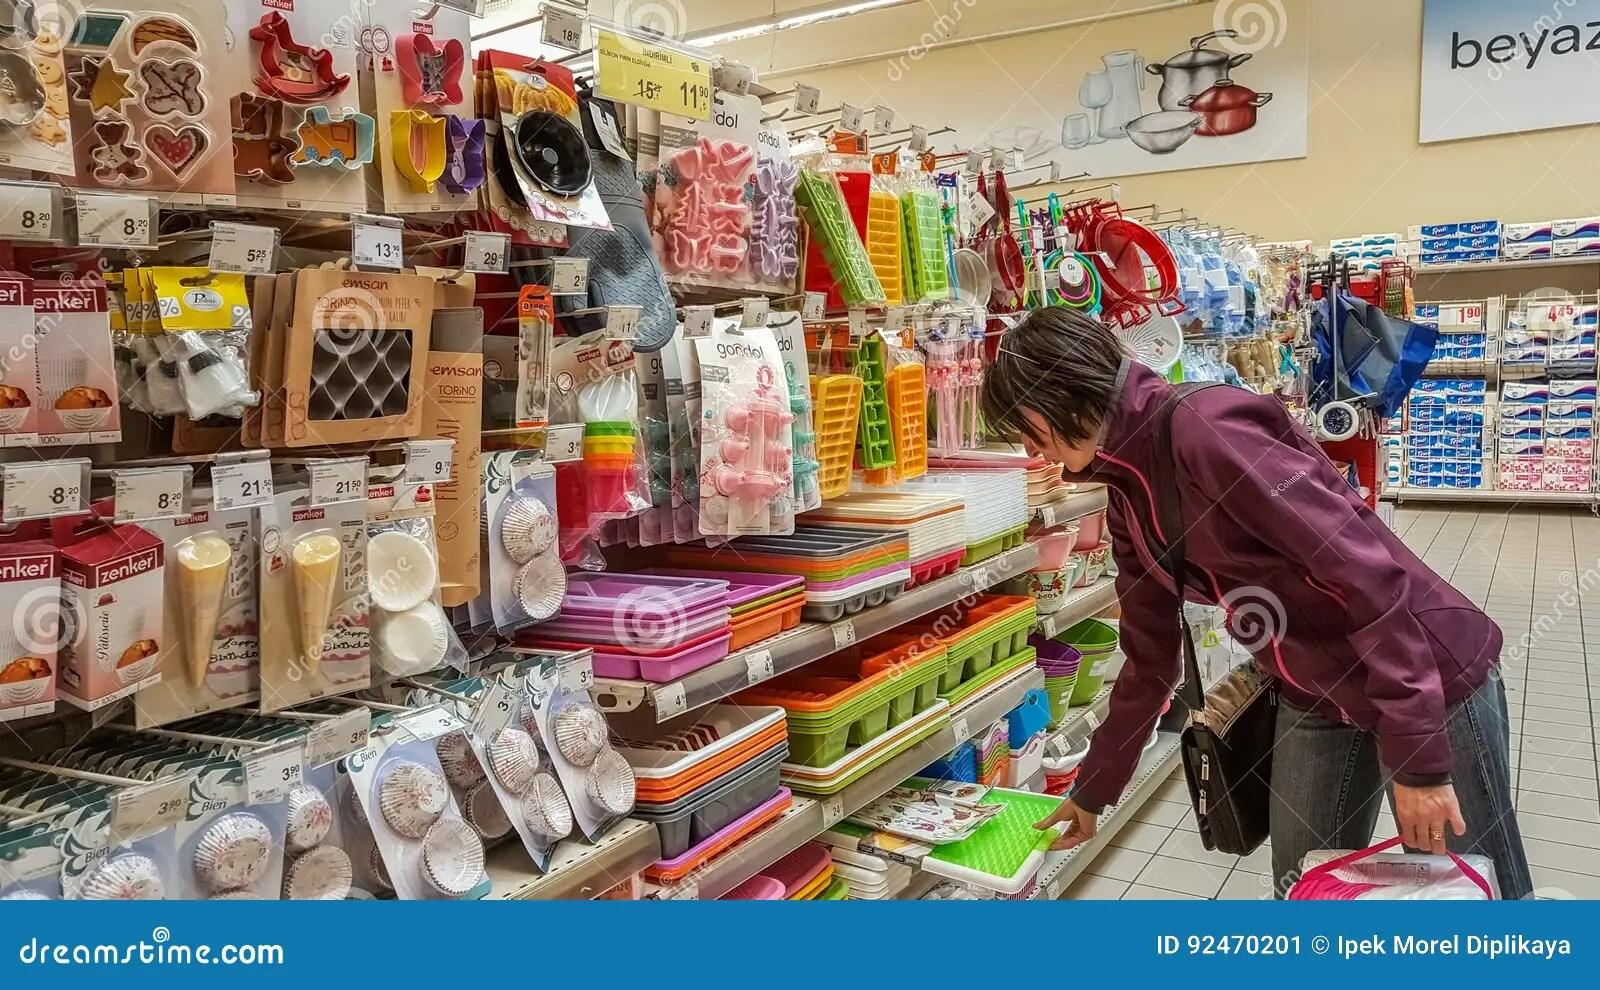 sears kitchen black faucet 埃斯基谢希尔 土耳其 2017年4月17日 厨房器物在超级市场的待售在埃斯 厨房器物在超级市场的待售在埃斯基谢希尔 土耳其搁置在厨房器物部分的少妇购物在商城